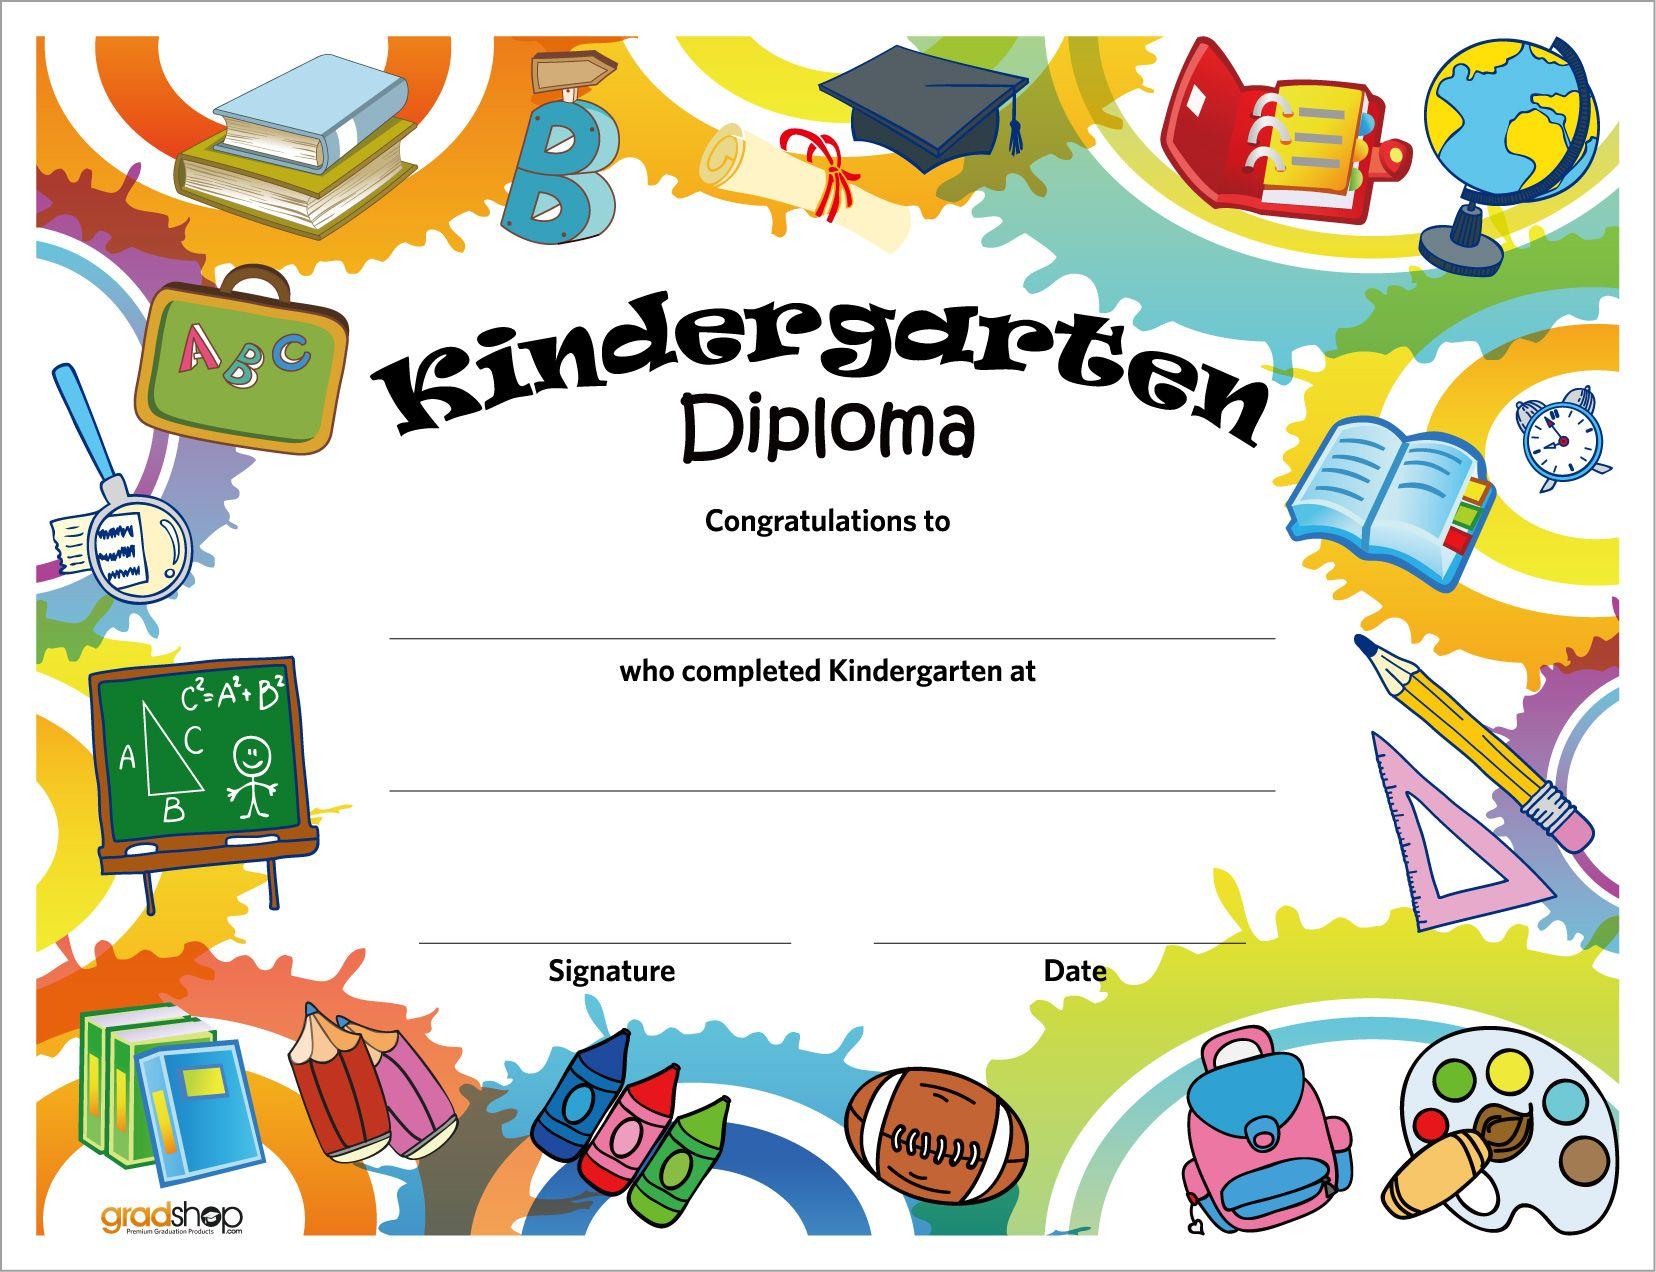 Diploma Para Cierre De Evento Preschool Diploma Graduation Certificate Template Kindergarten Graduation Certificates Free Preschool diplomas templates printable free